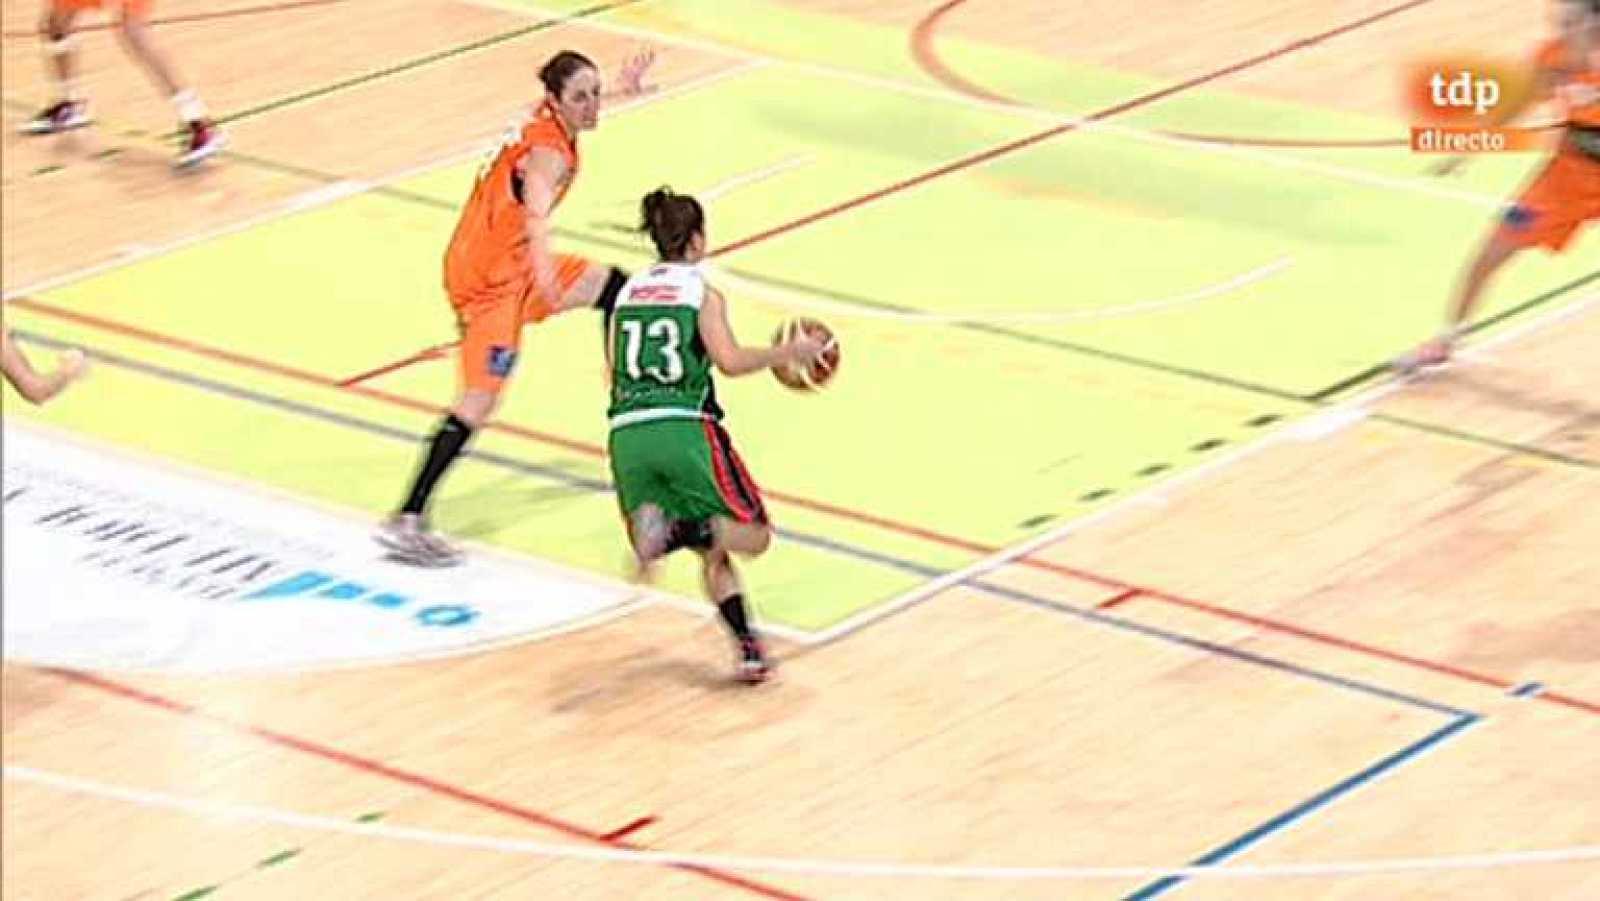 Baloncesto - Liga española femenina. 18ª jornada: Bizkaia GDKO - CD Zamarat- Ver ahora